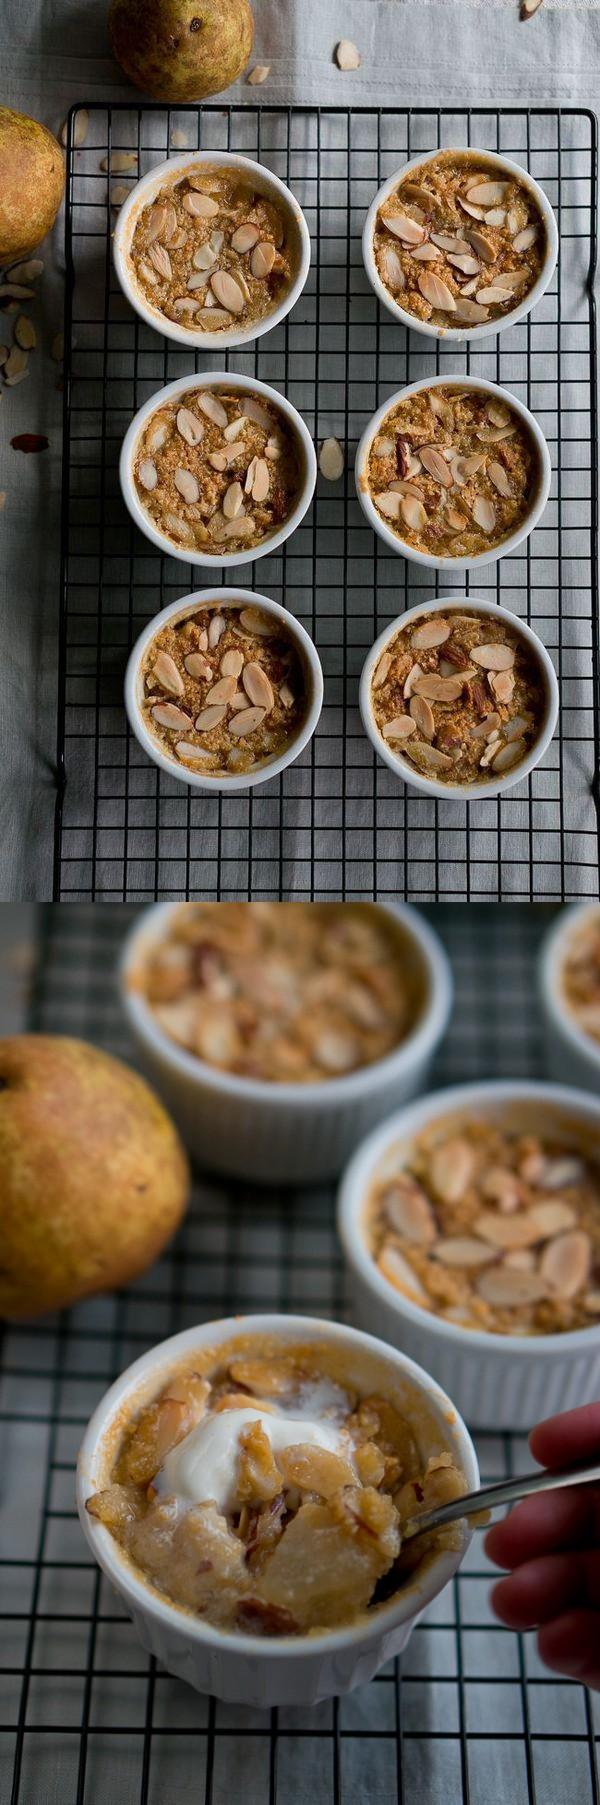 Paleo Pear and Almond Crisp